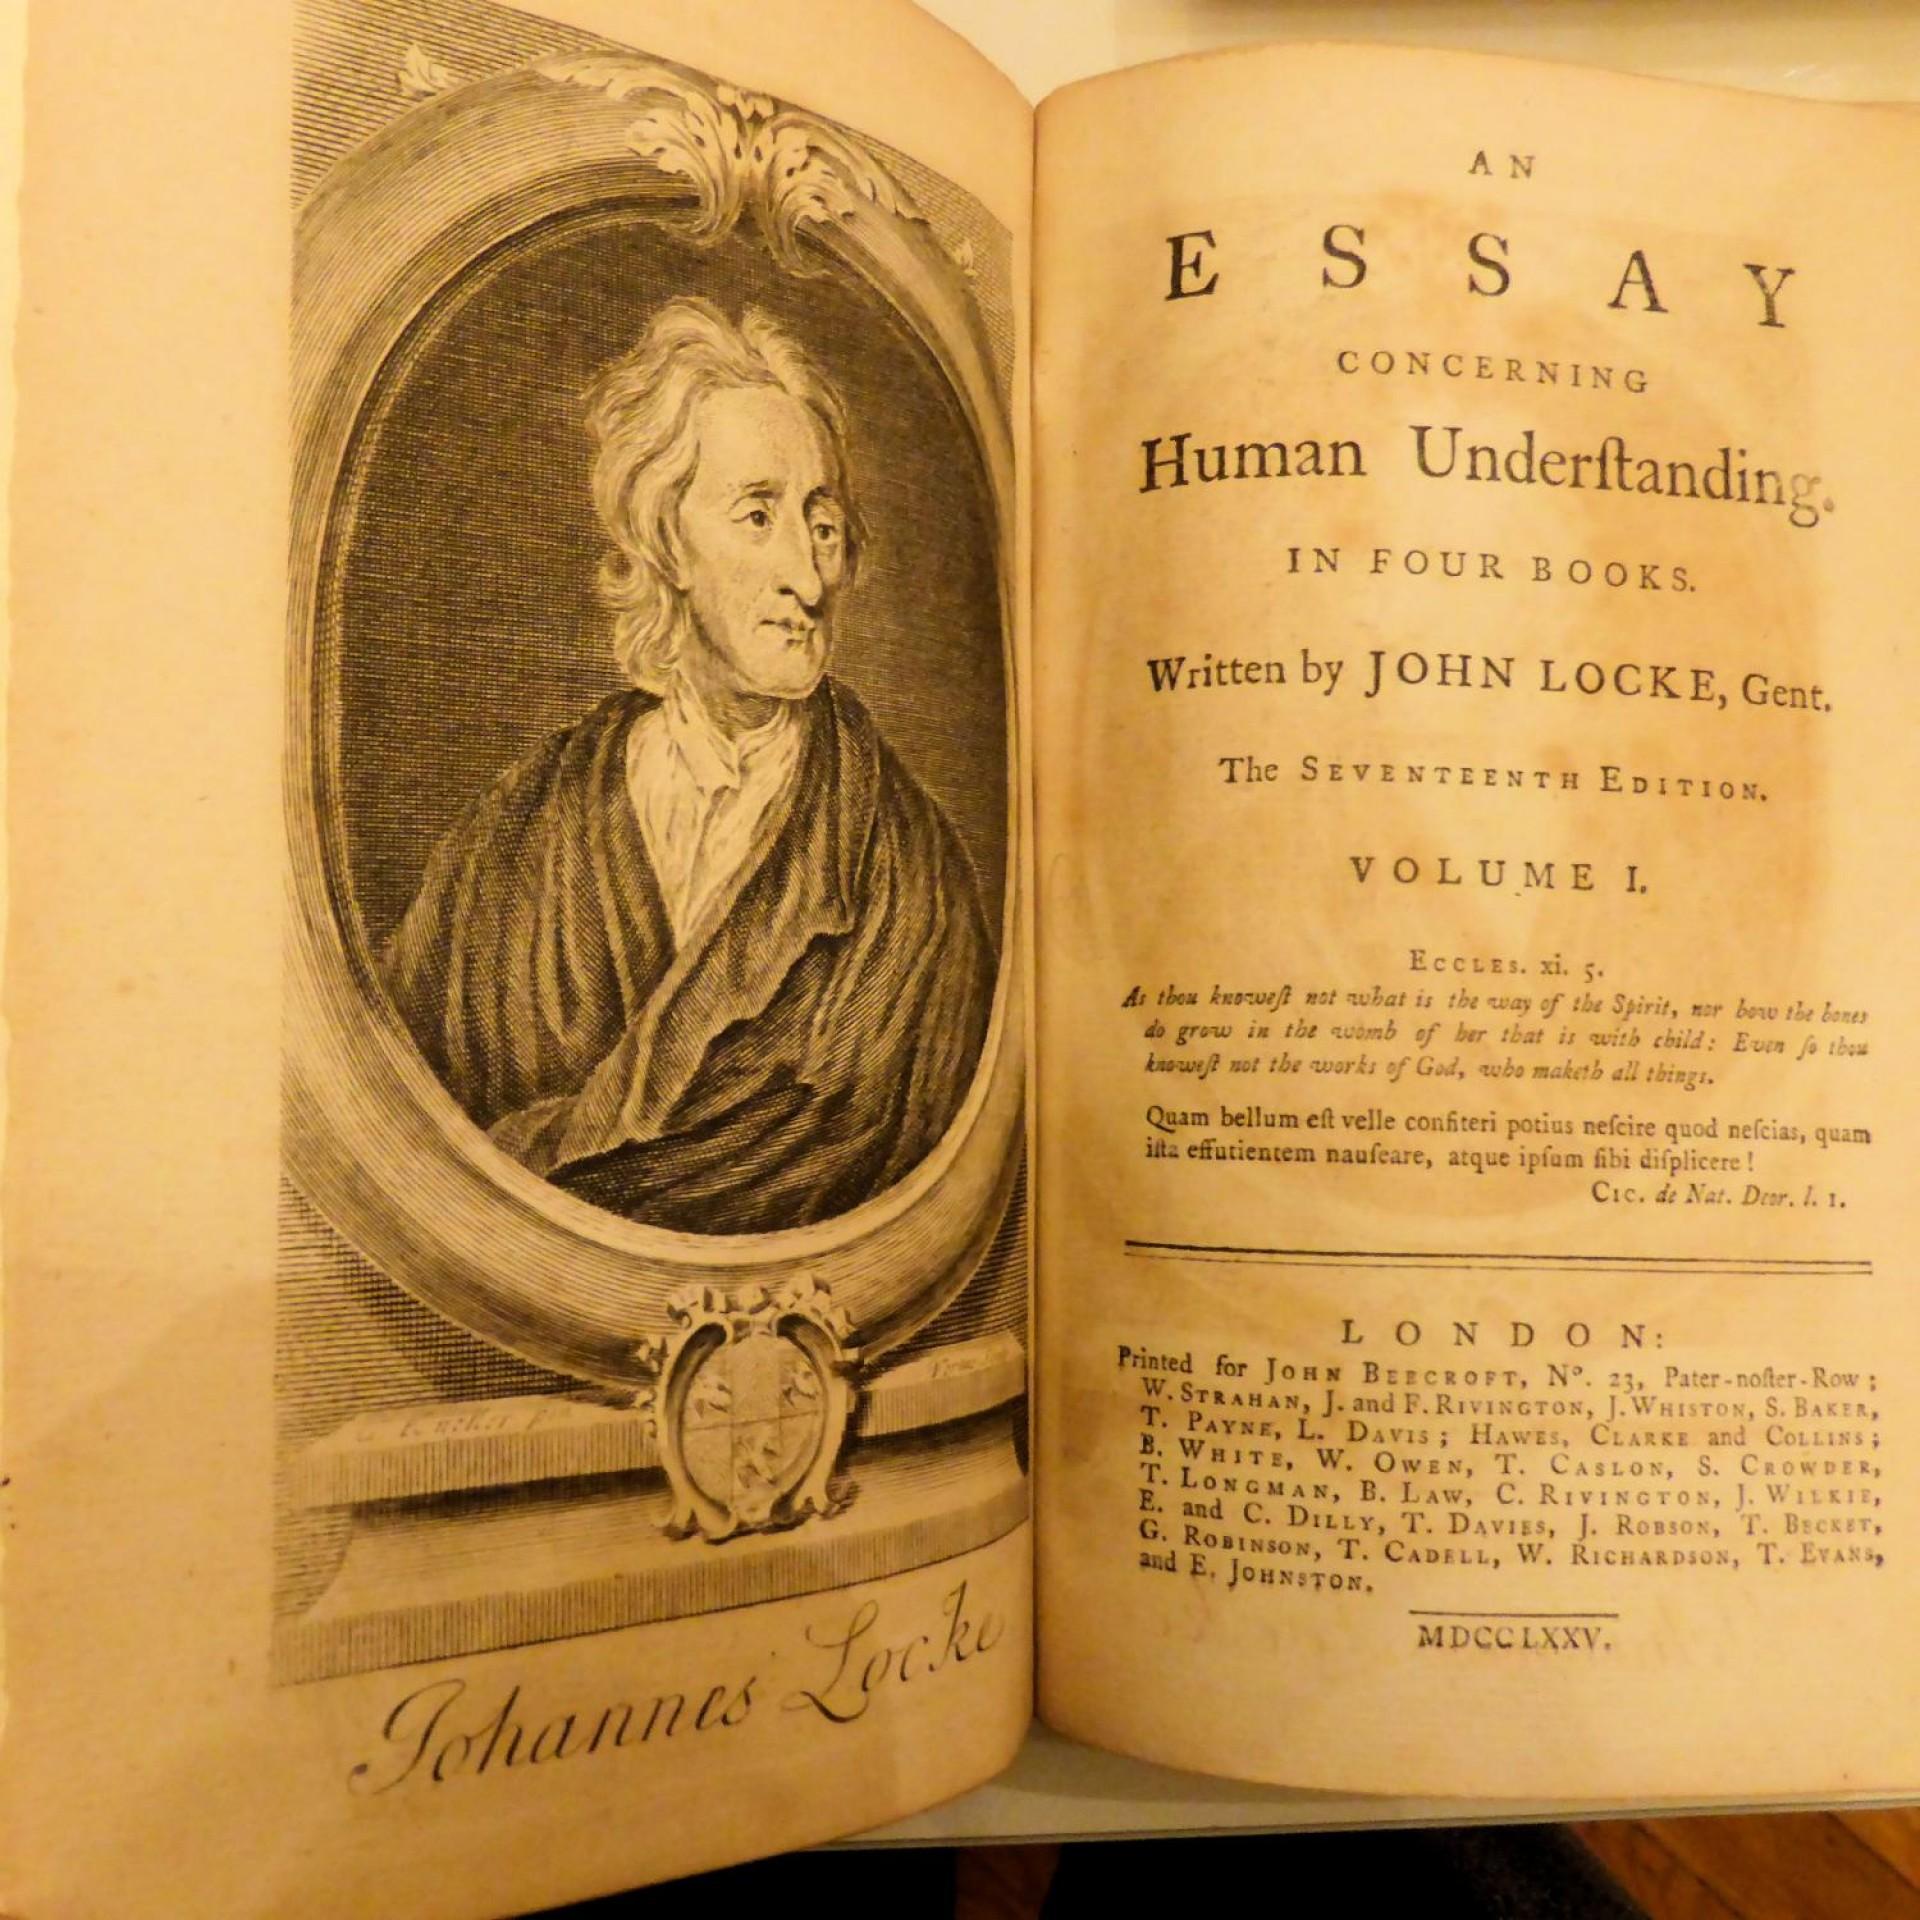 016 John Locke Essay Impressive Concerning Human Understanding Book 4 On Pdf Summary 1920